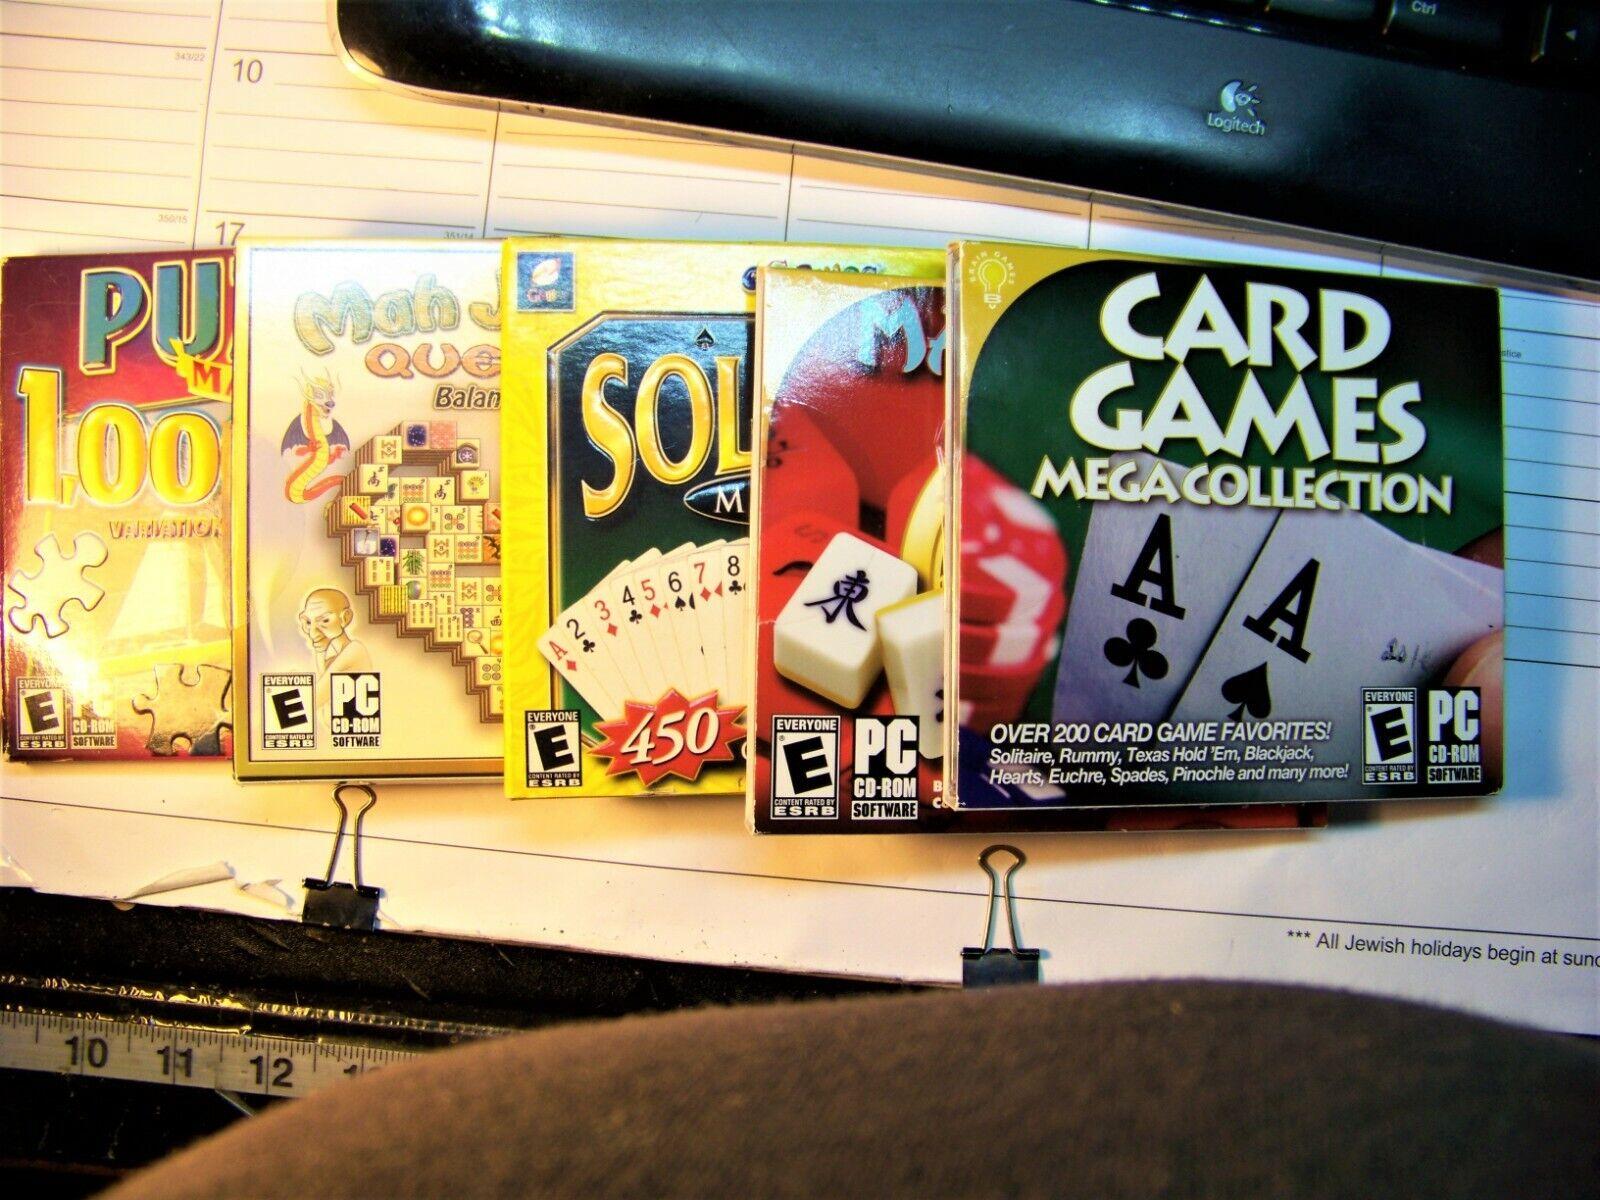 Computer Games - LOT OF 5, VARIOUS COMPUTER GAMES